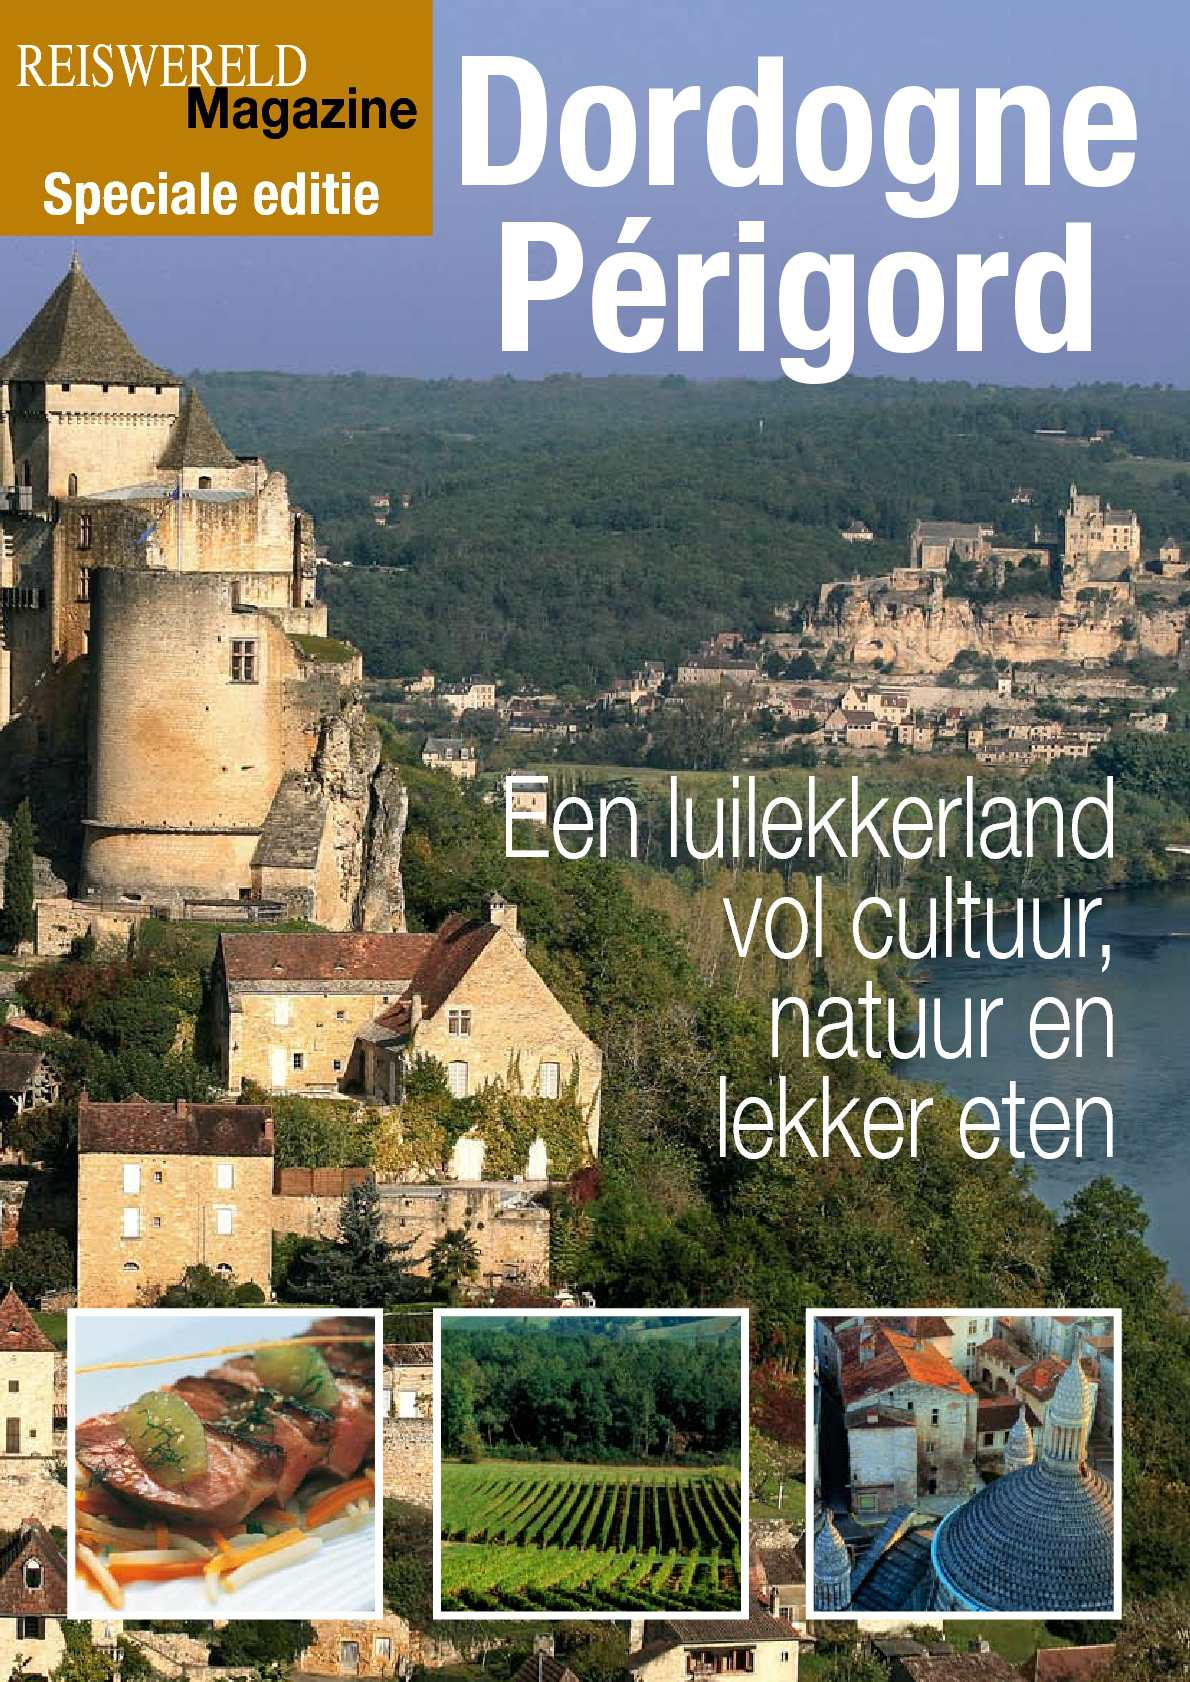 Reportage in de Dordogne-Périgord van Reiswereld Magazine.be